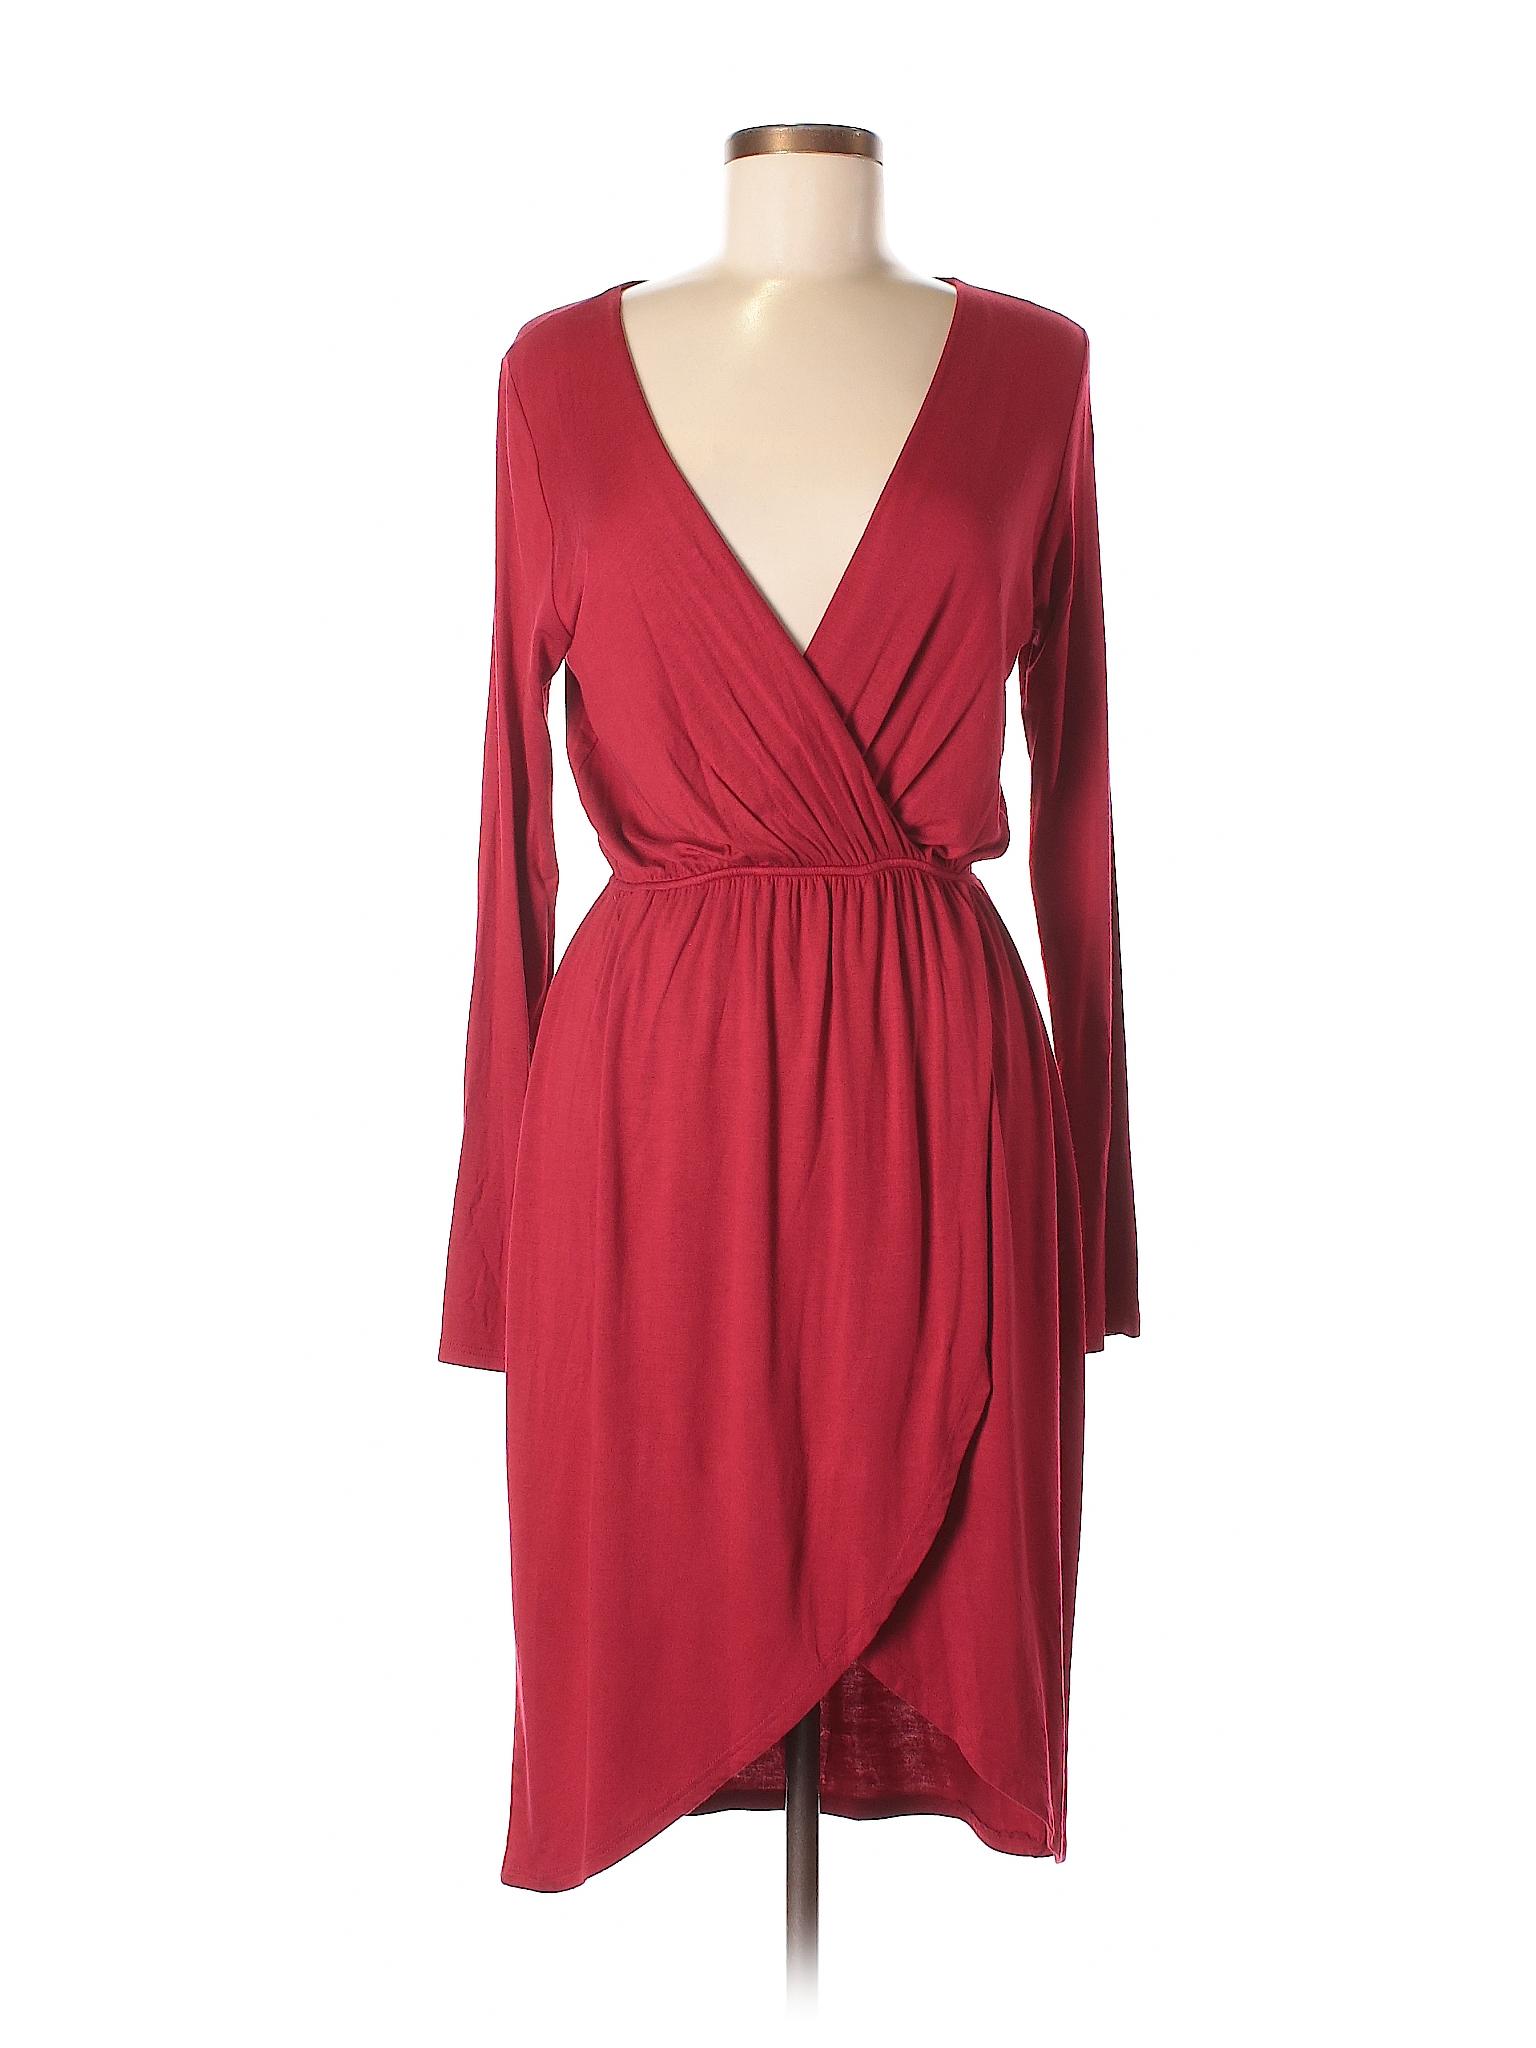 Casual Selling Casual Alya Selling Dress Alya Dress Selling zZU1zrx